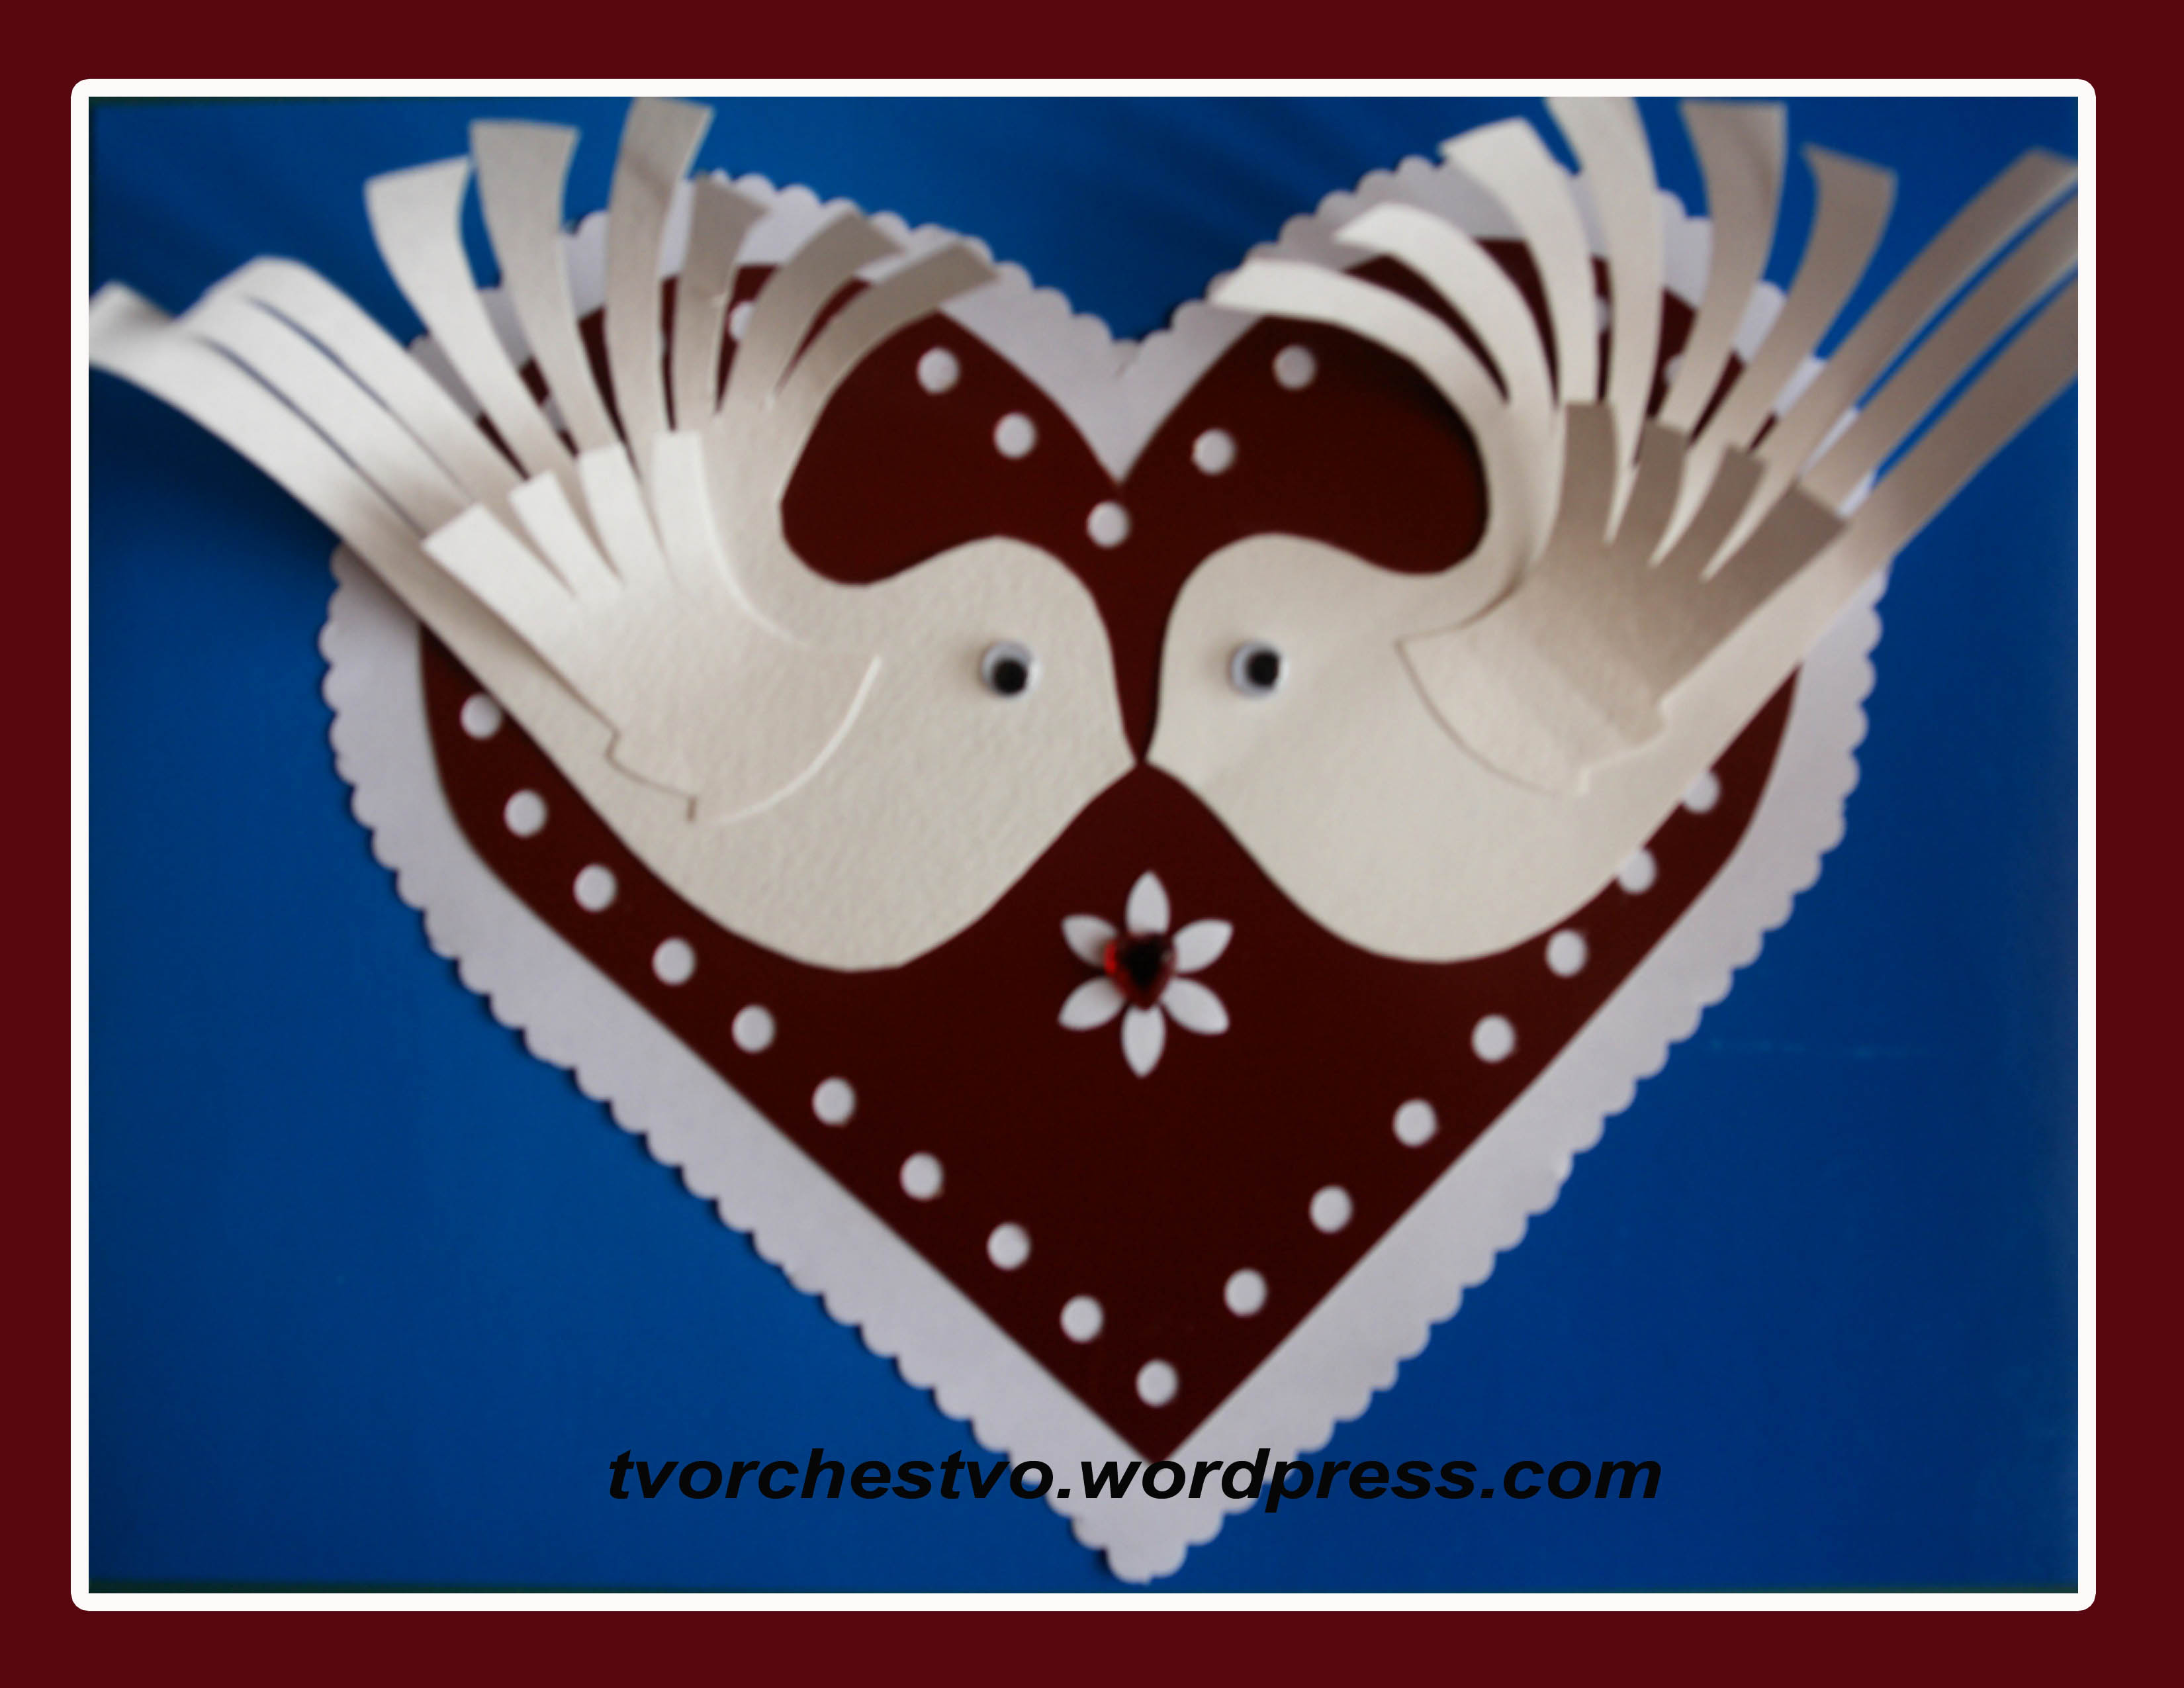 Валентинка с голубями. Обсуждение на